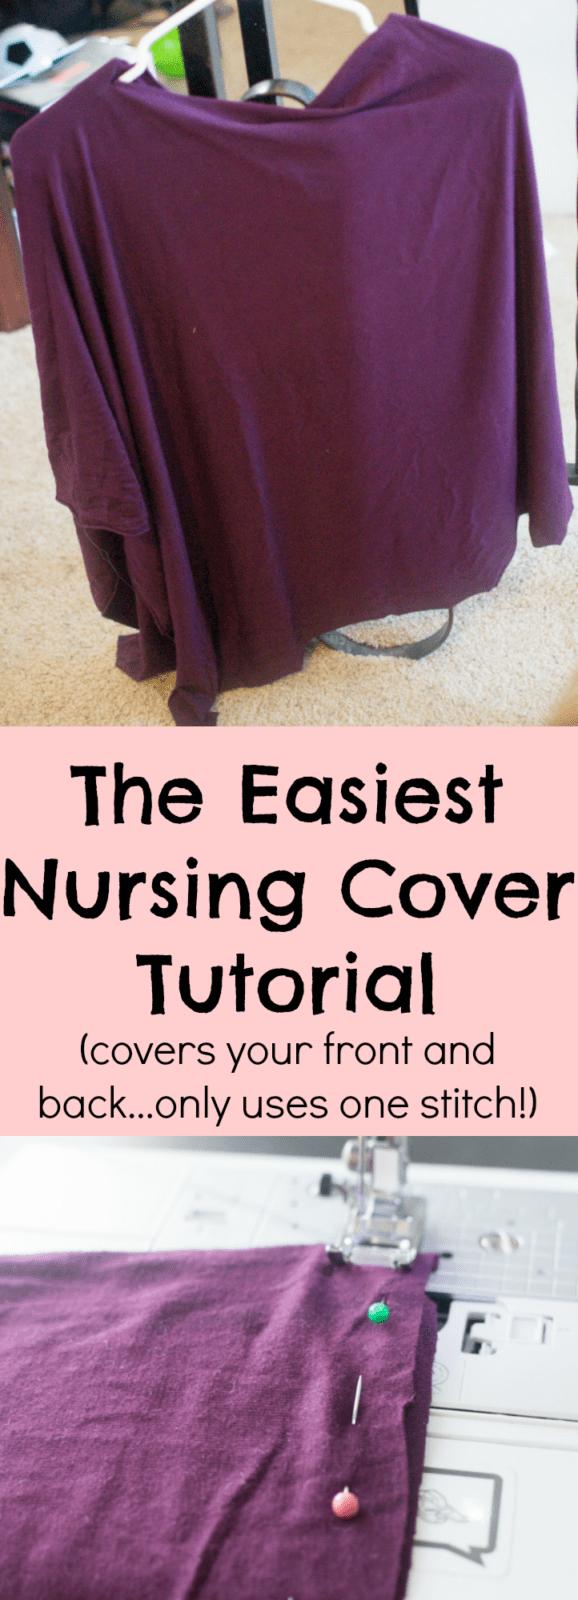 nursing cover / diy nursing cover / easy nursing cover / easy diy nursing cover / breastfeeding cover / poncho nursing cover